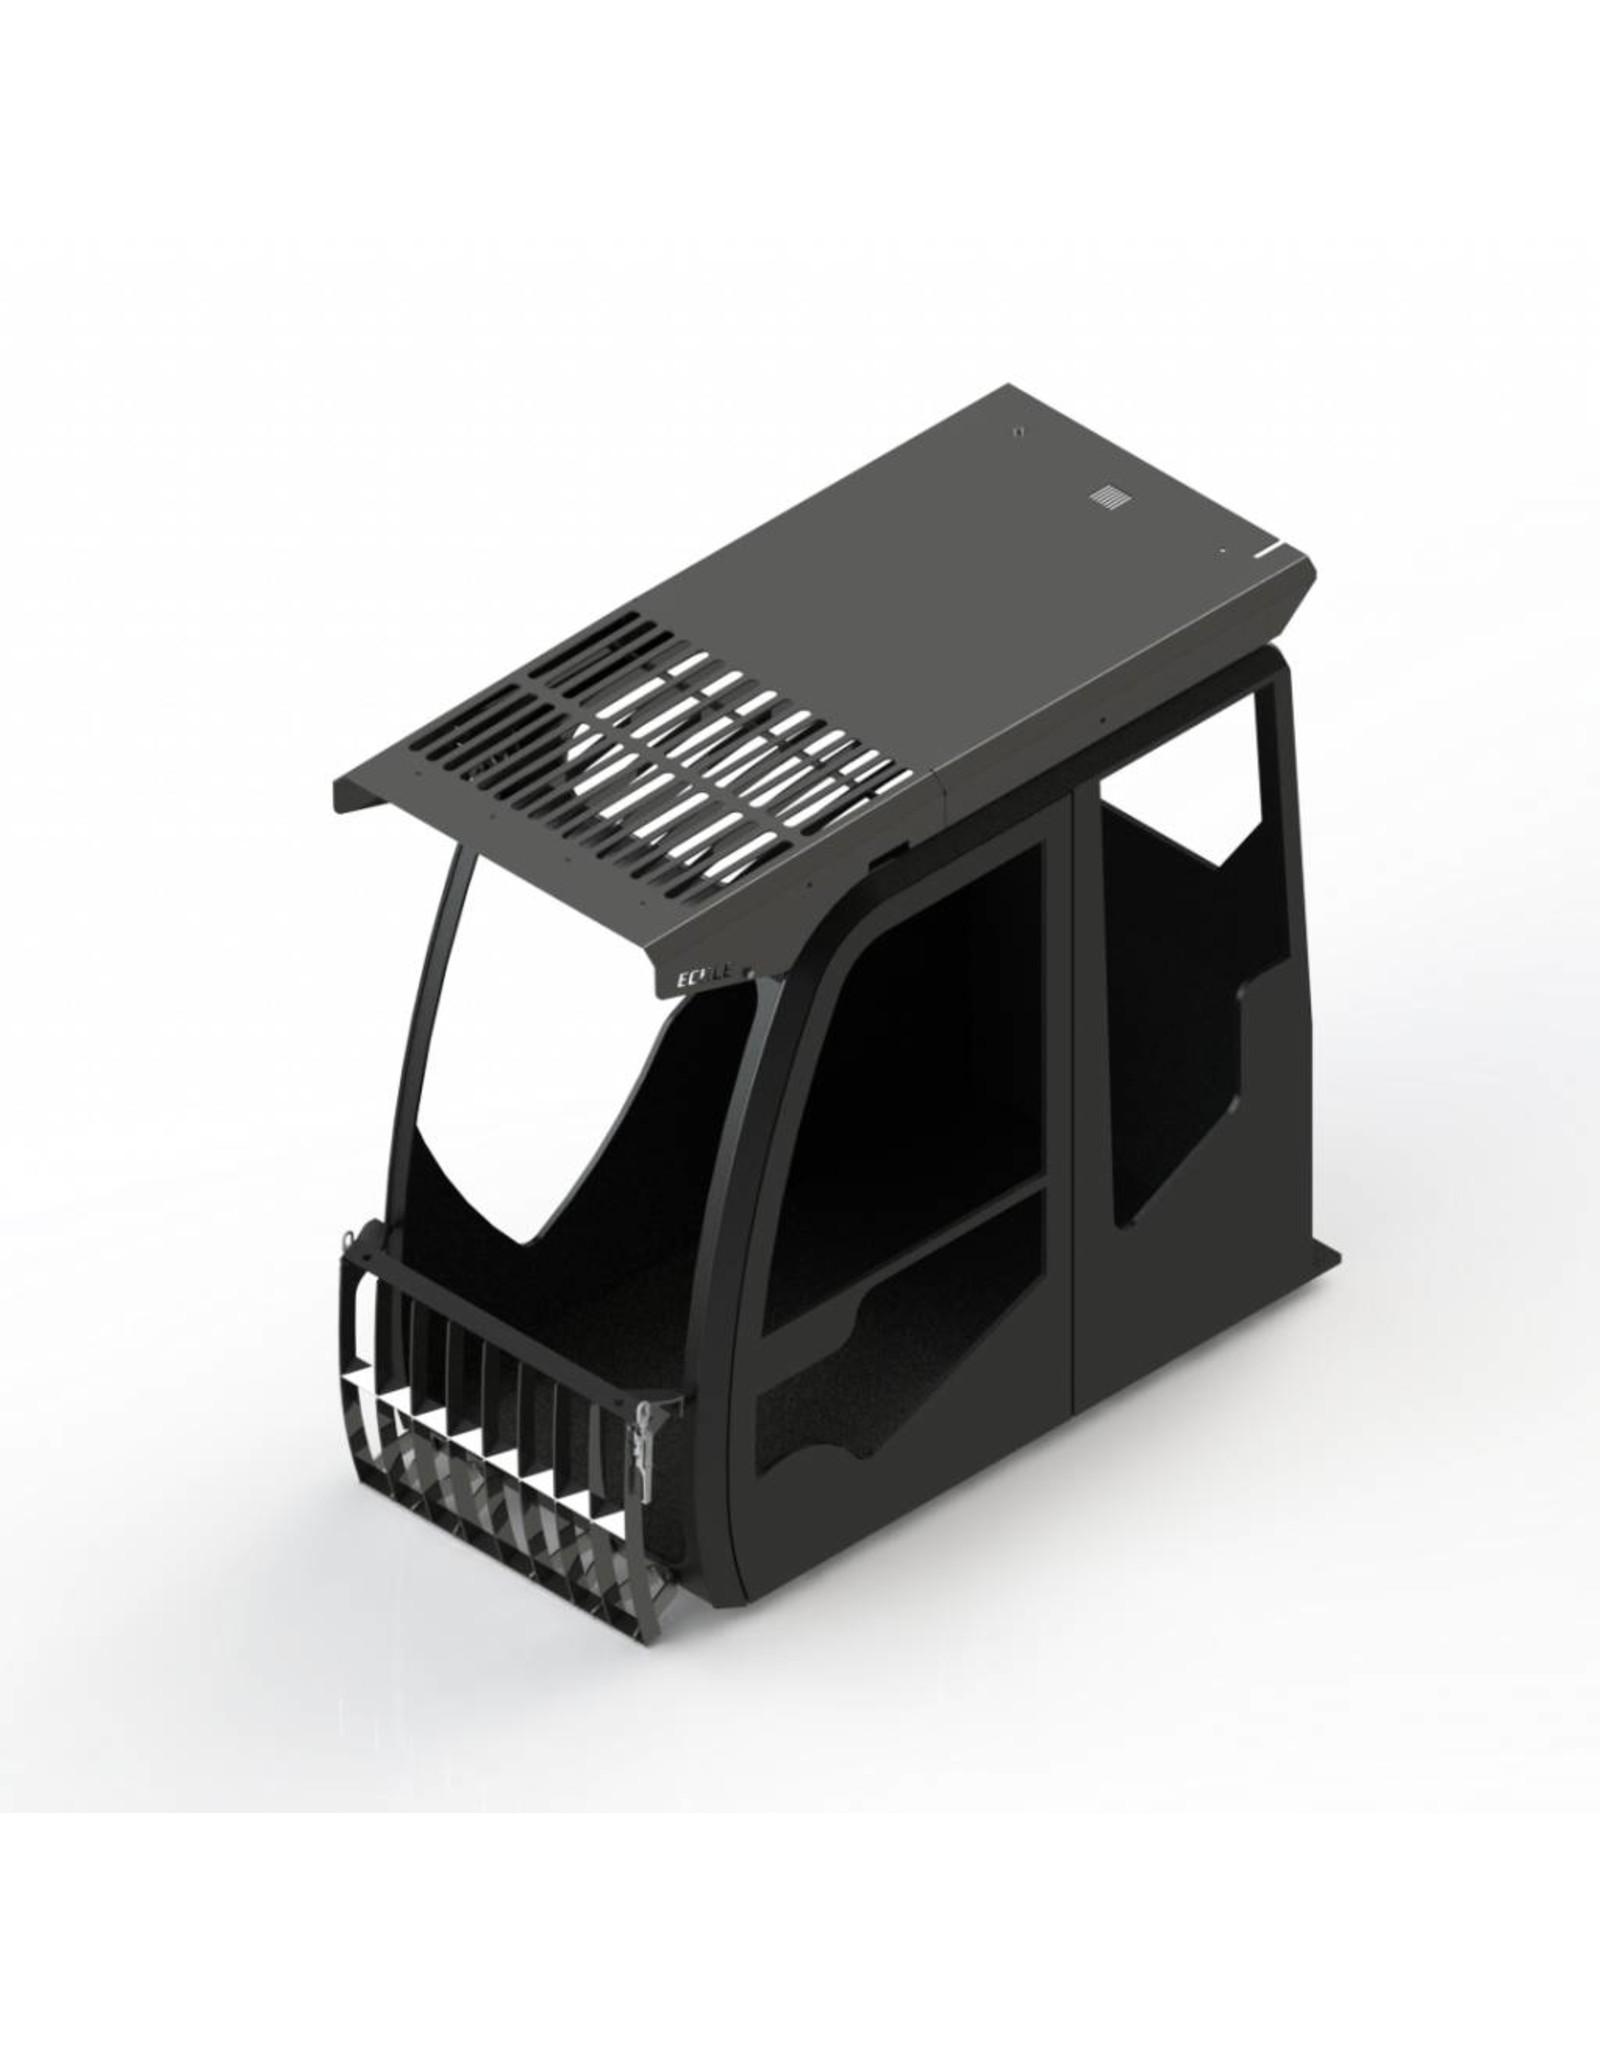 Echle Hartstahl GmbH FOPS for Liebherr R 936